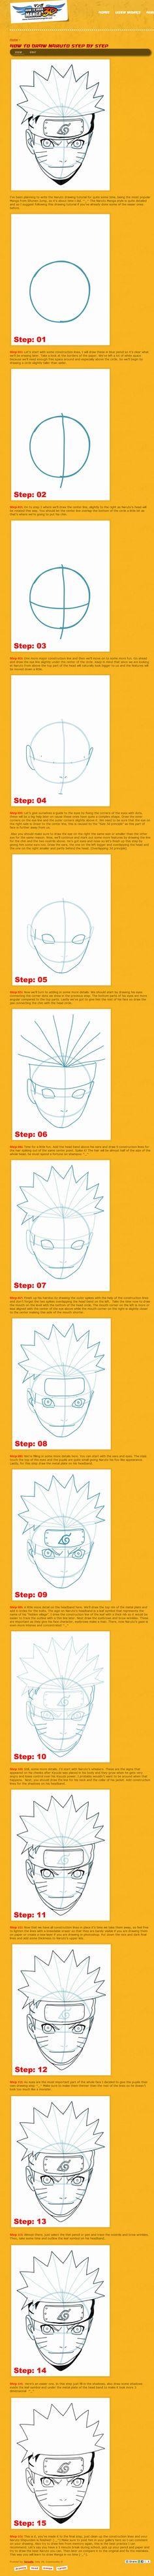 How to Draw Naruto Tutorial by Naruto Sketch Drawing, Naruto Drawings, Naruto Art, Anime Sketch, Manga Drawing, Itachi, Gaara, Manga Tutorial, Sketches Tutorial